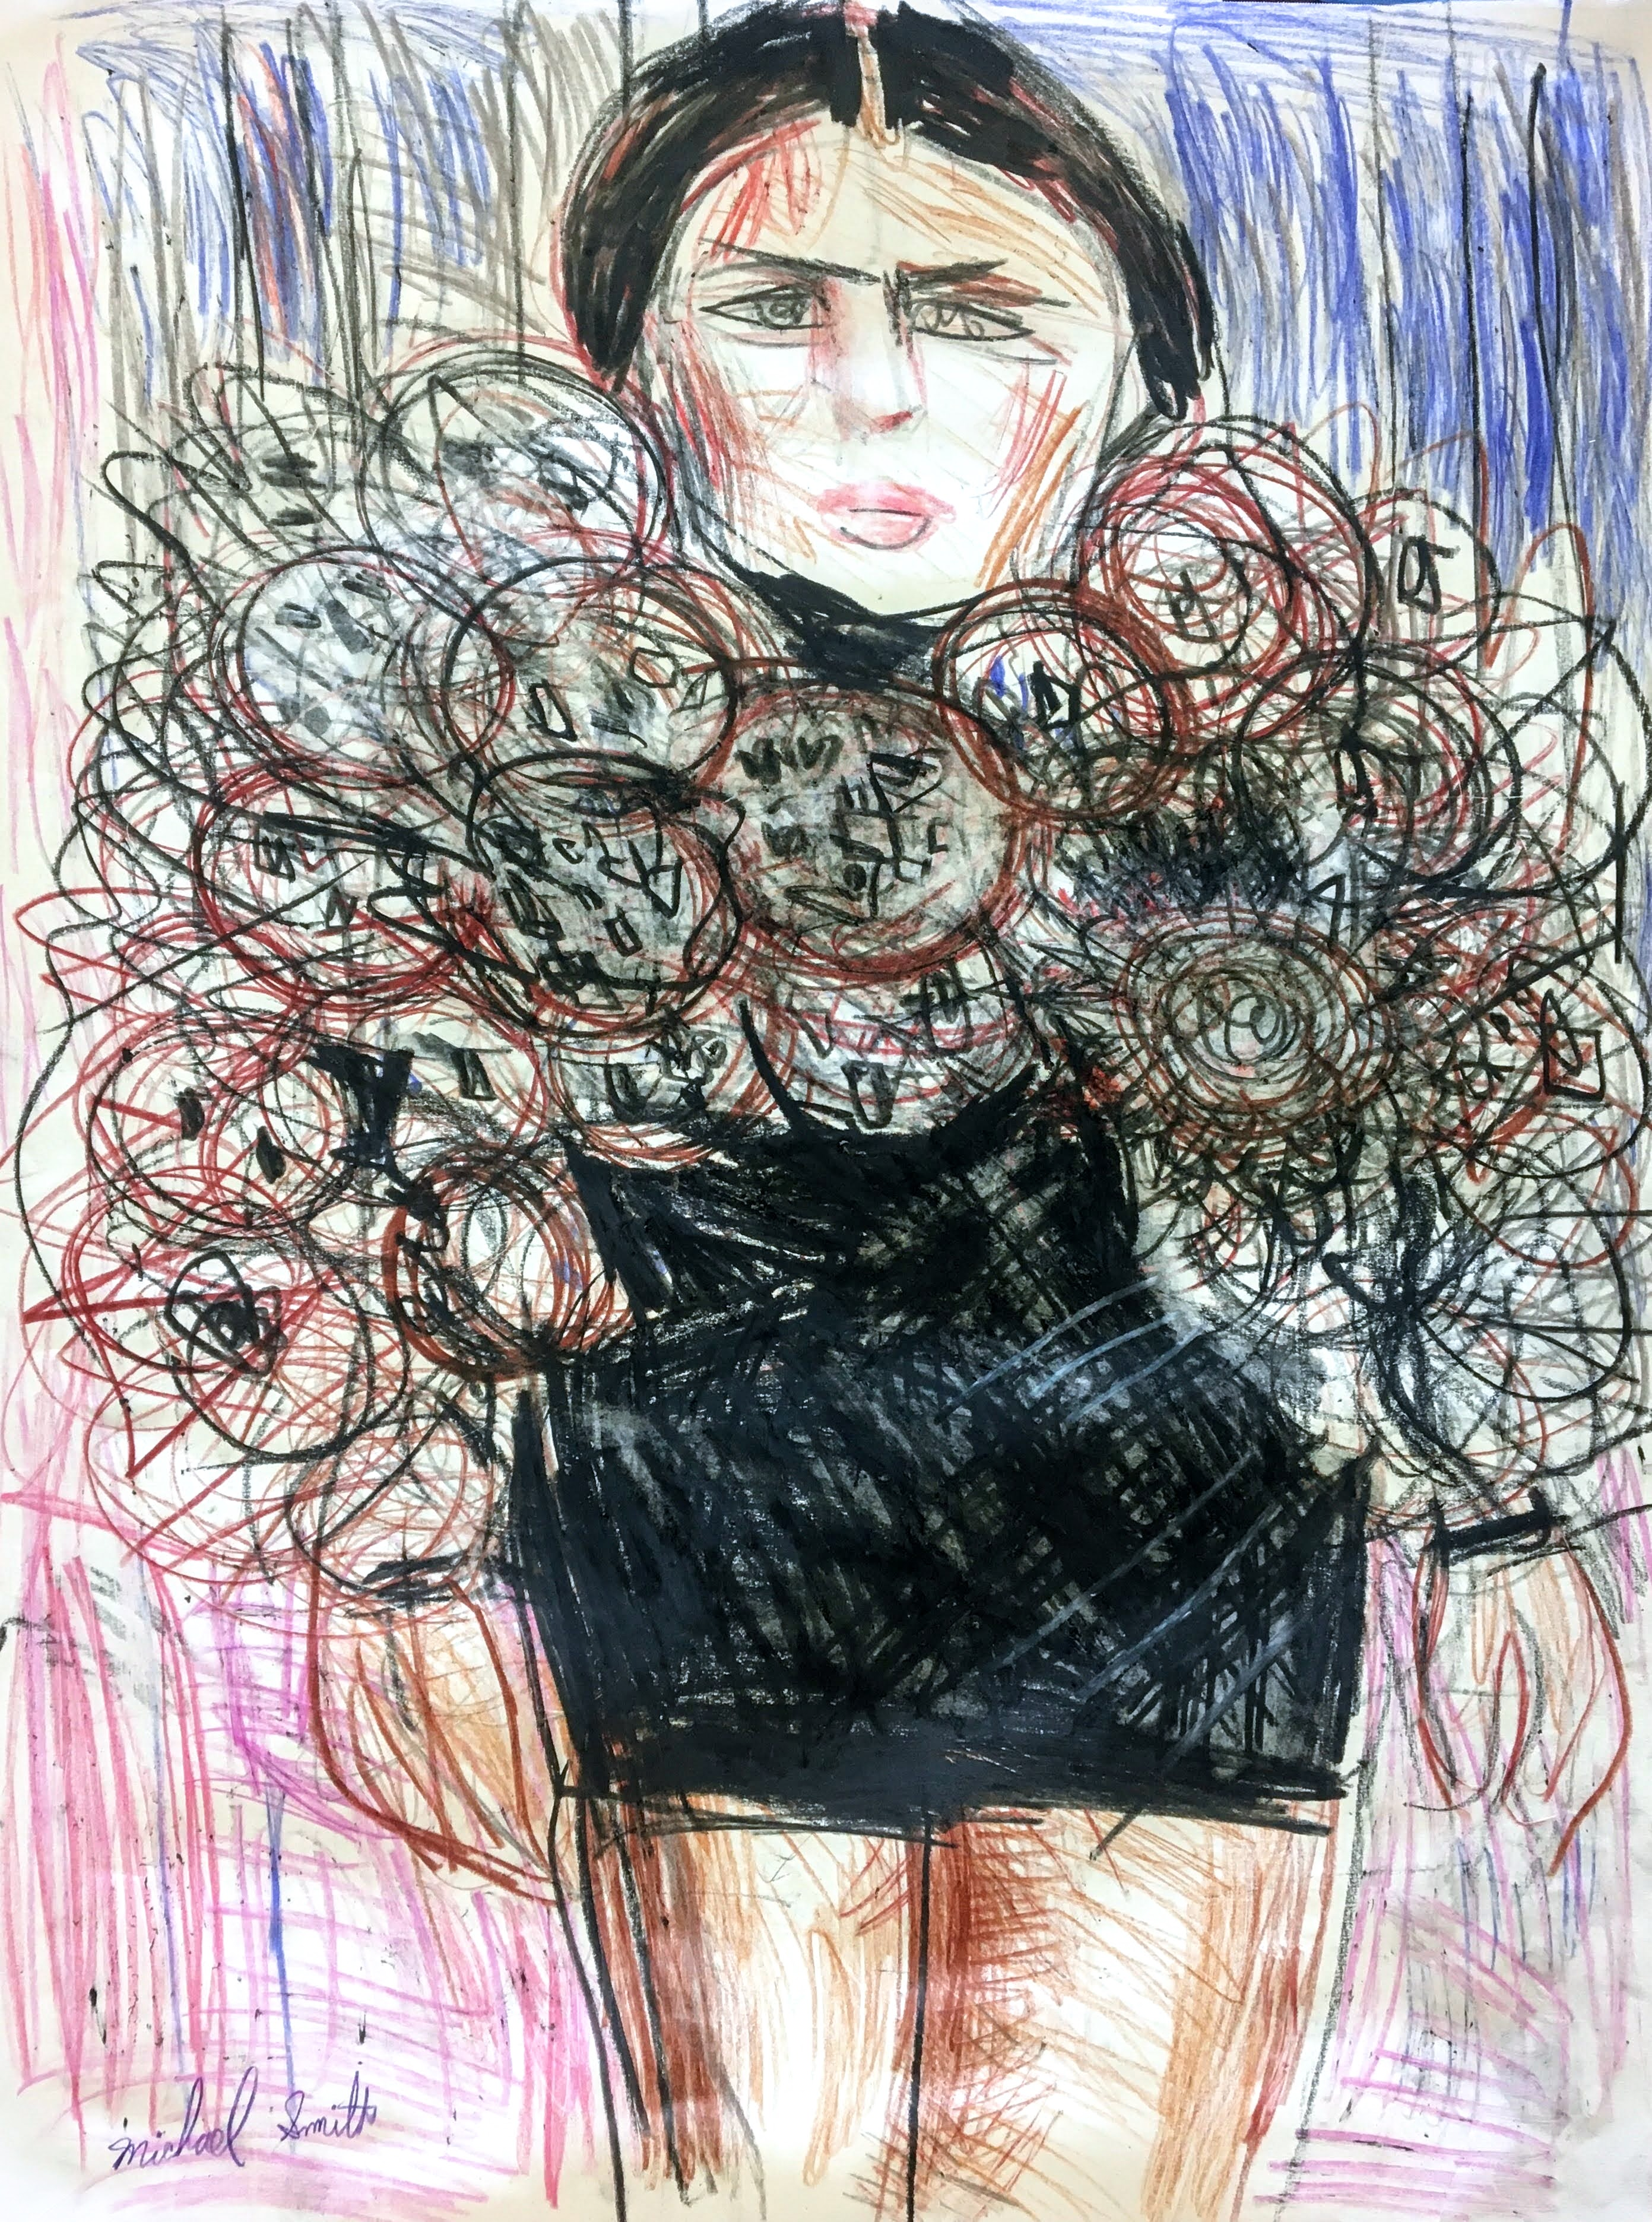 """Bubble Dress"" by Michael Smith"